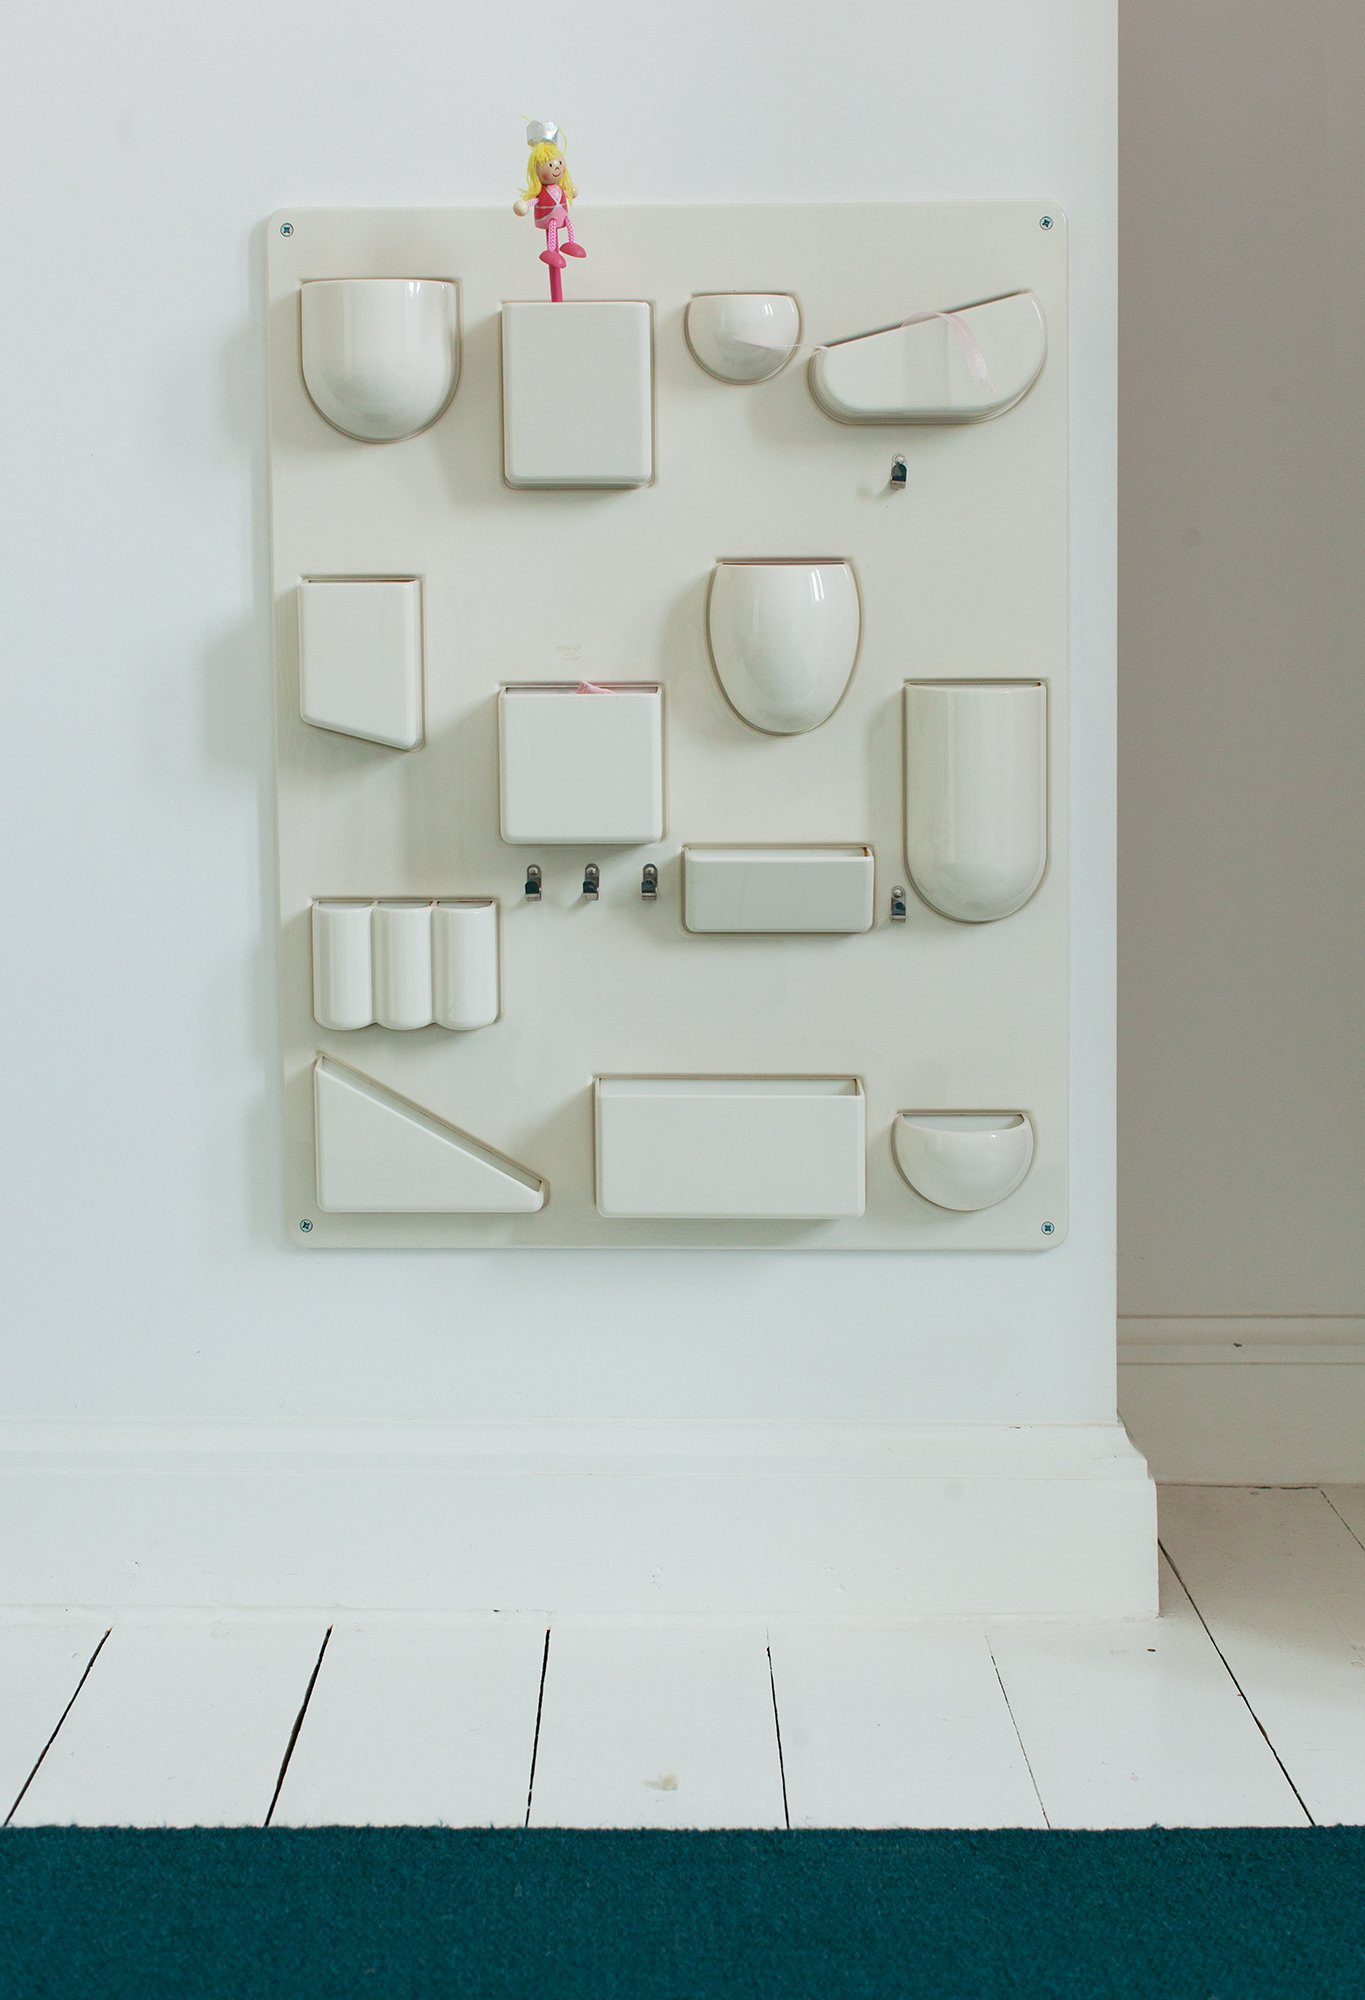 Rangement mural blanc en plastique Appartement Designer Marina Bautier Bruxelles